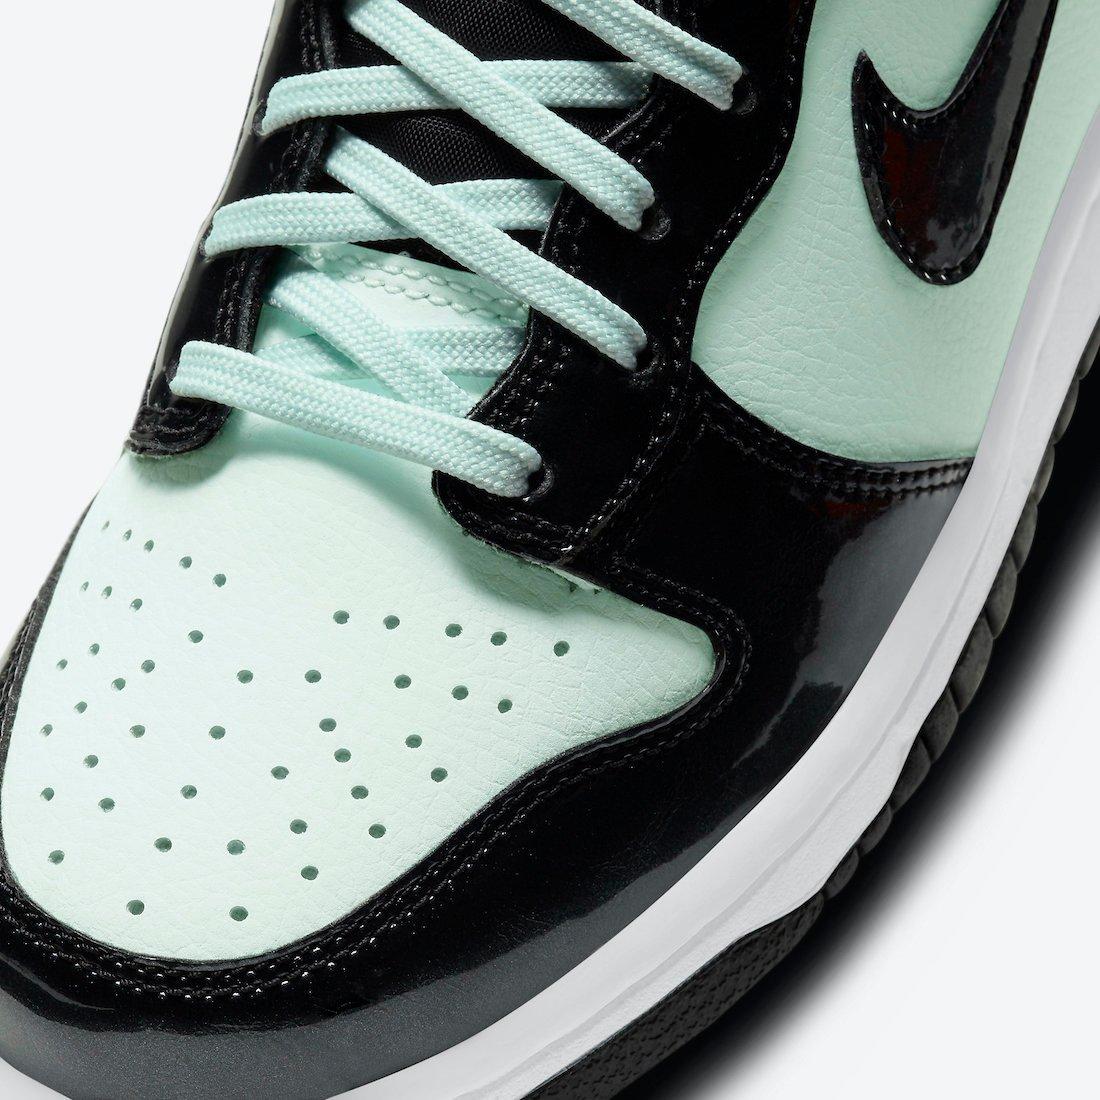 Nike Dunk High All-Star 2021 DD1846-300 Release Date Info